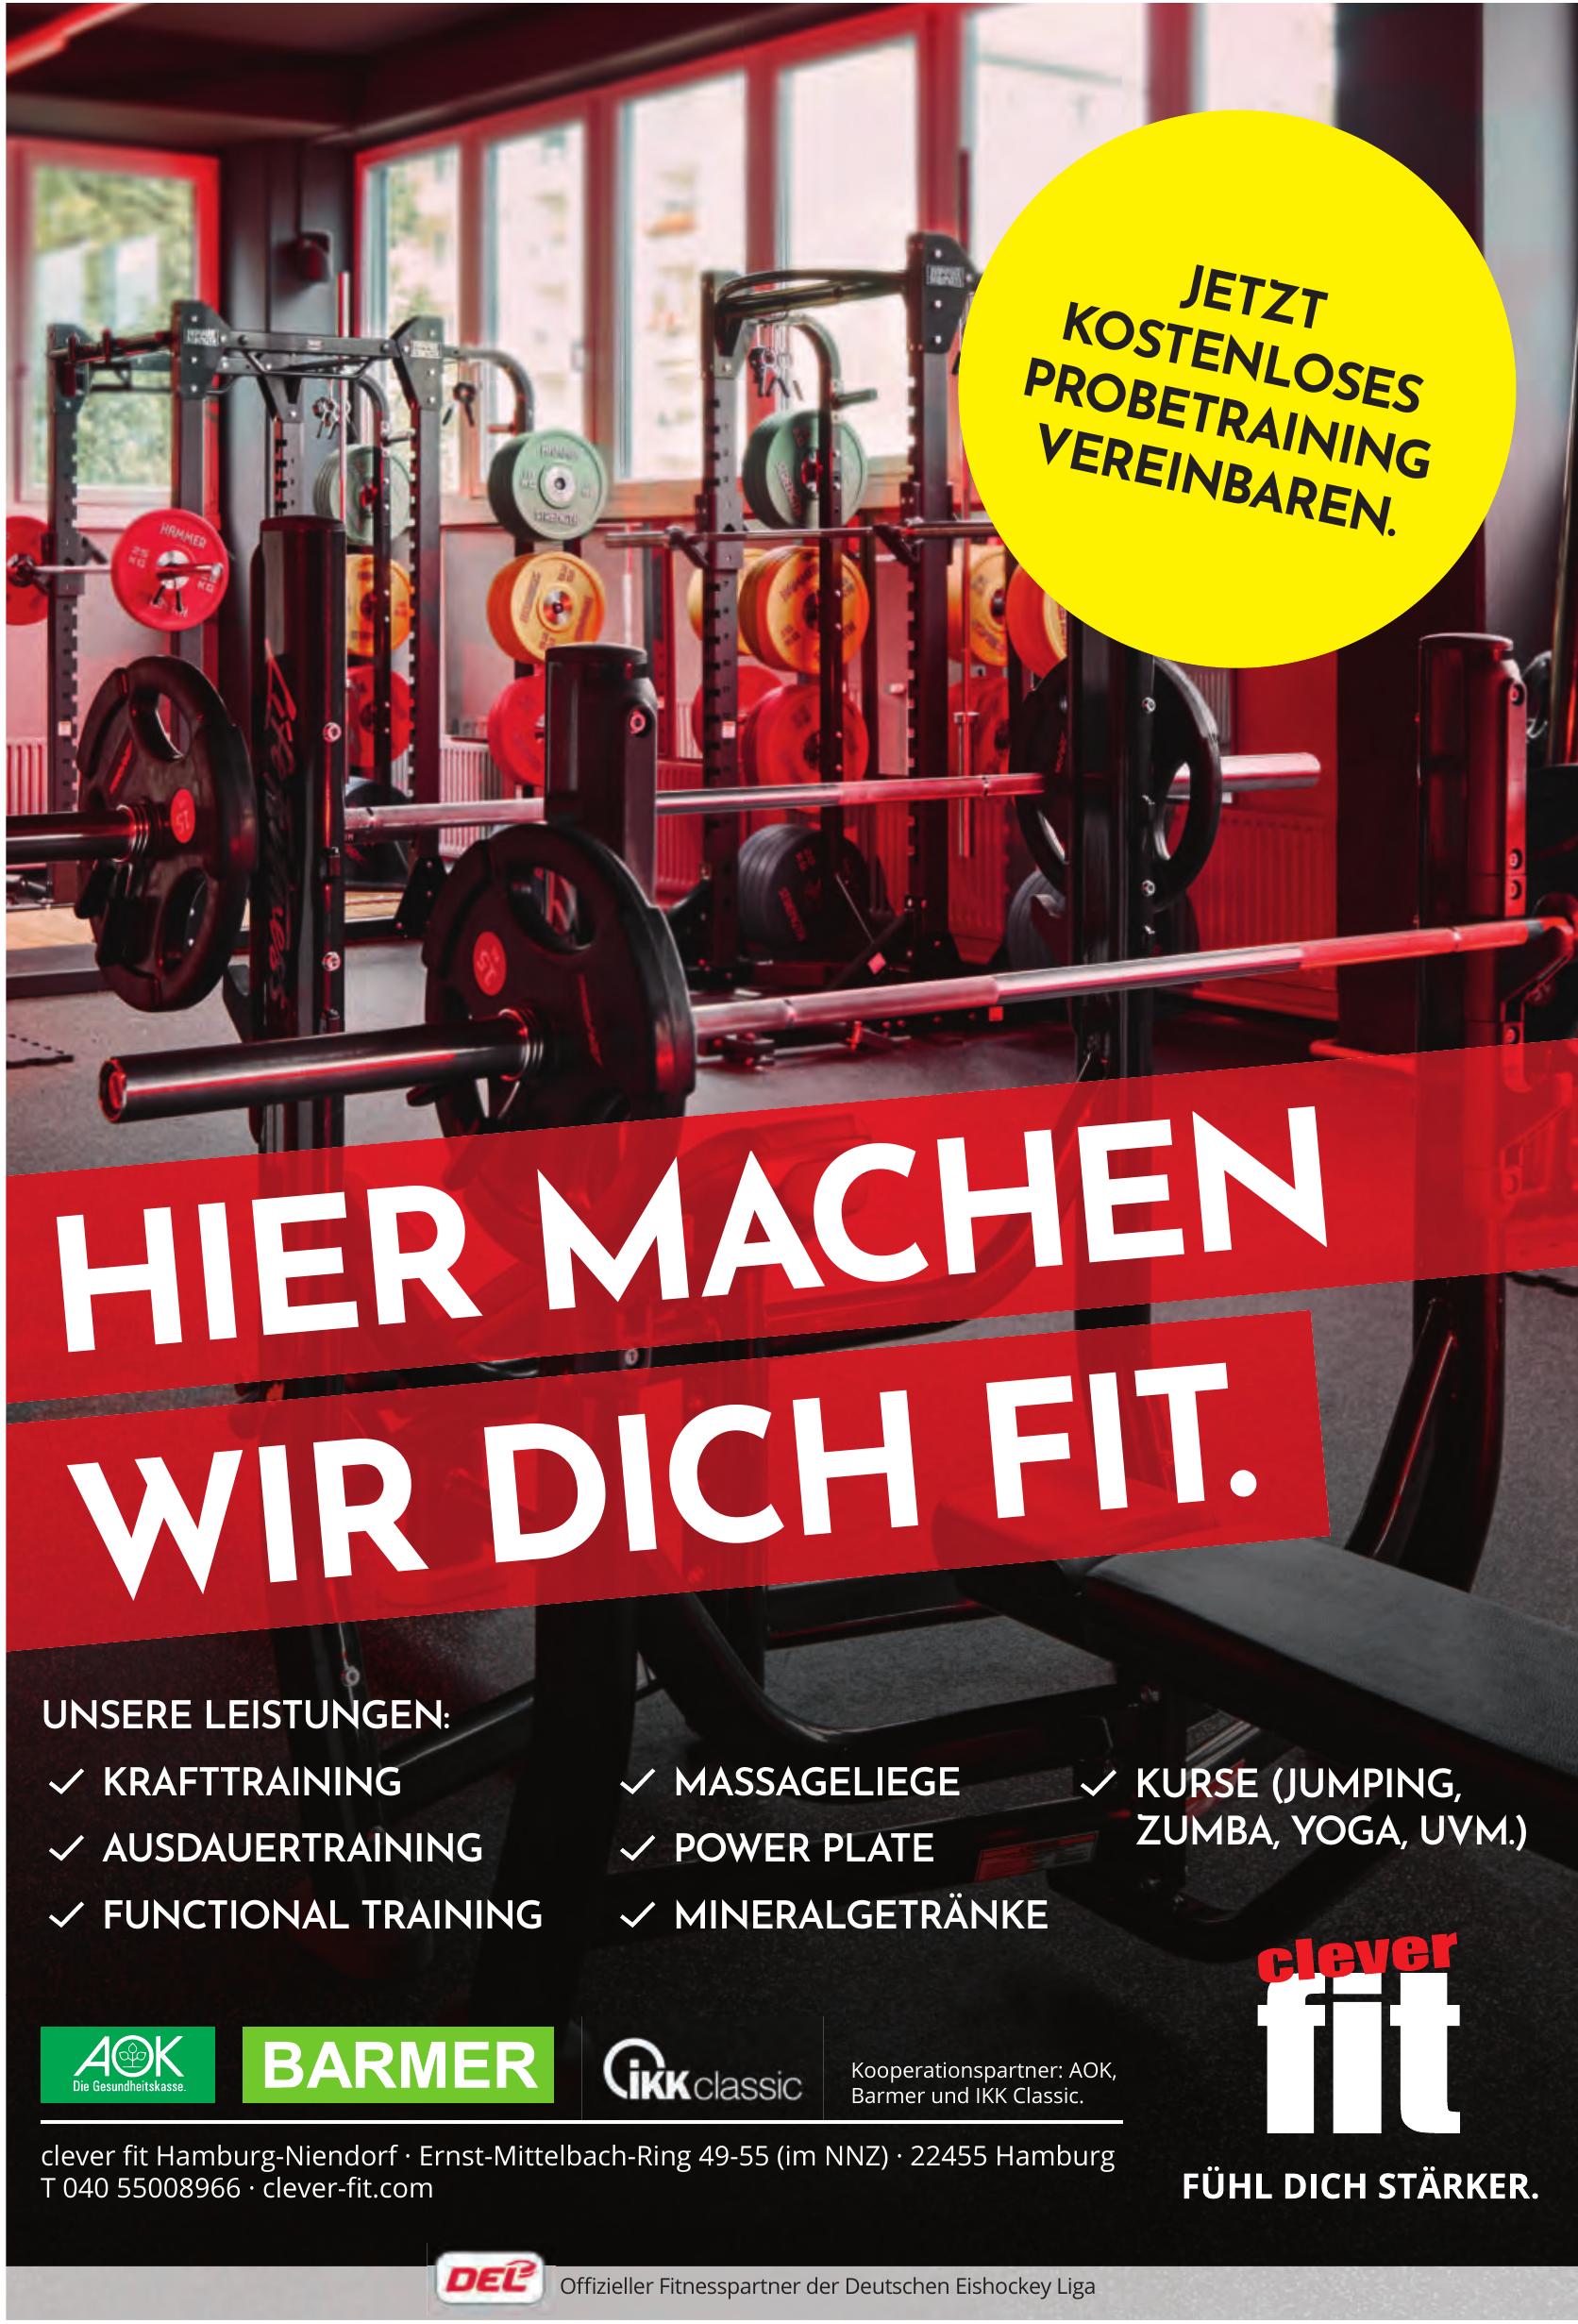 clever fit Hamburg-Niendorf